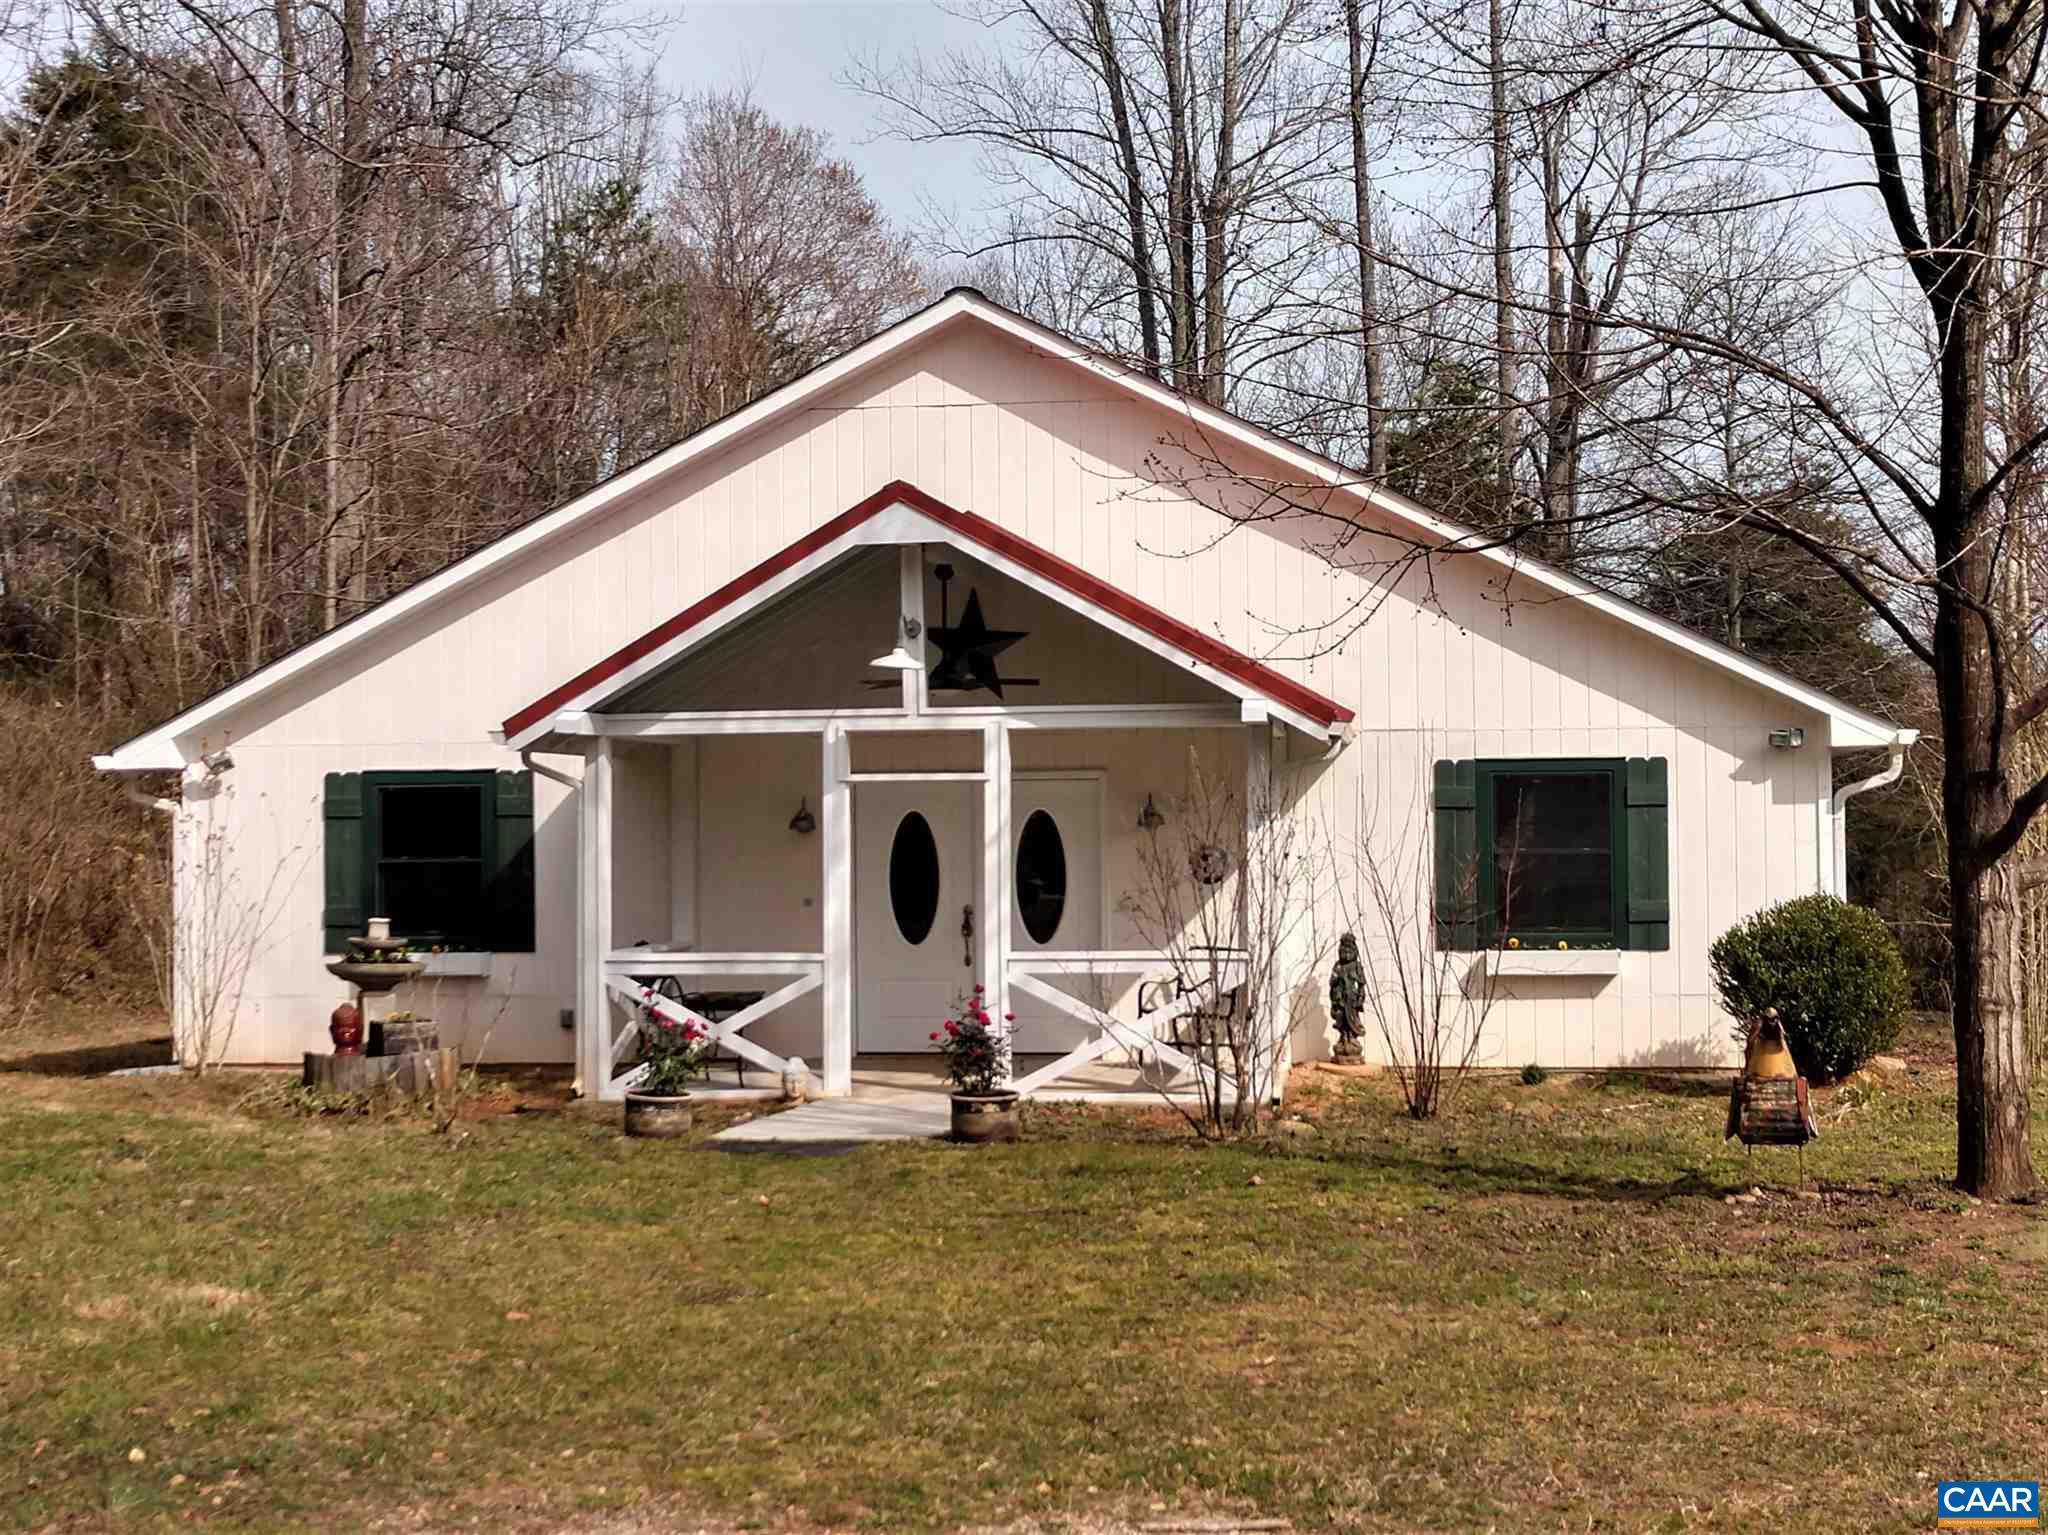 1631 COW HOLLOW RD, ROSELAND, VA 22967